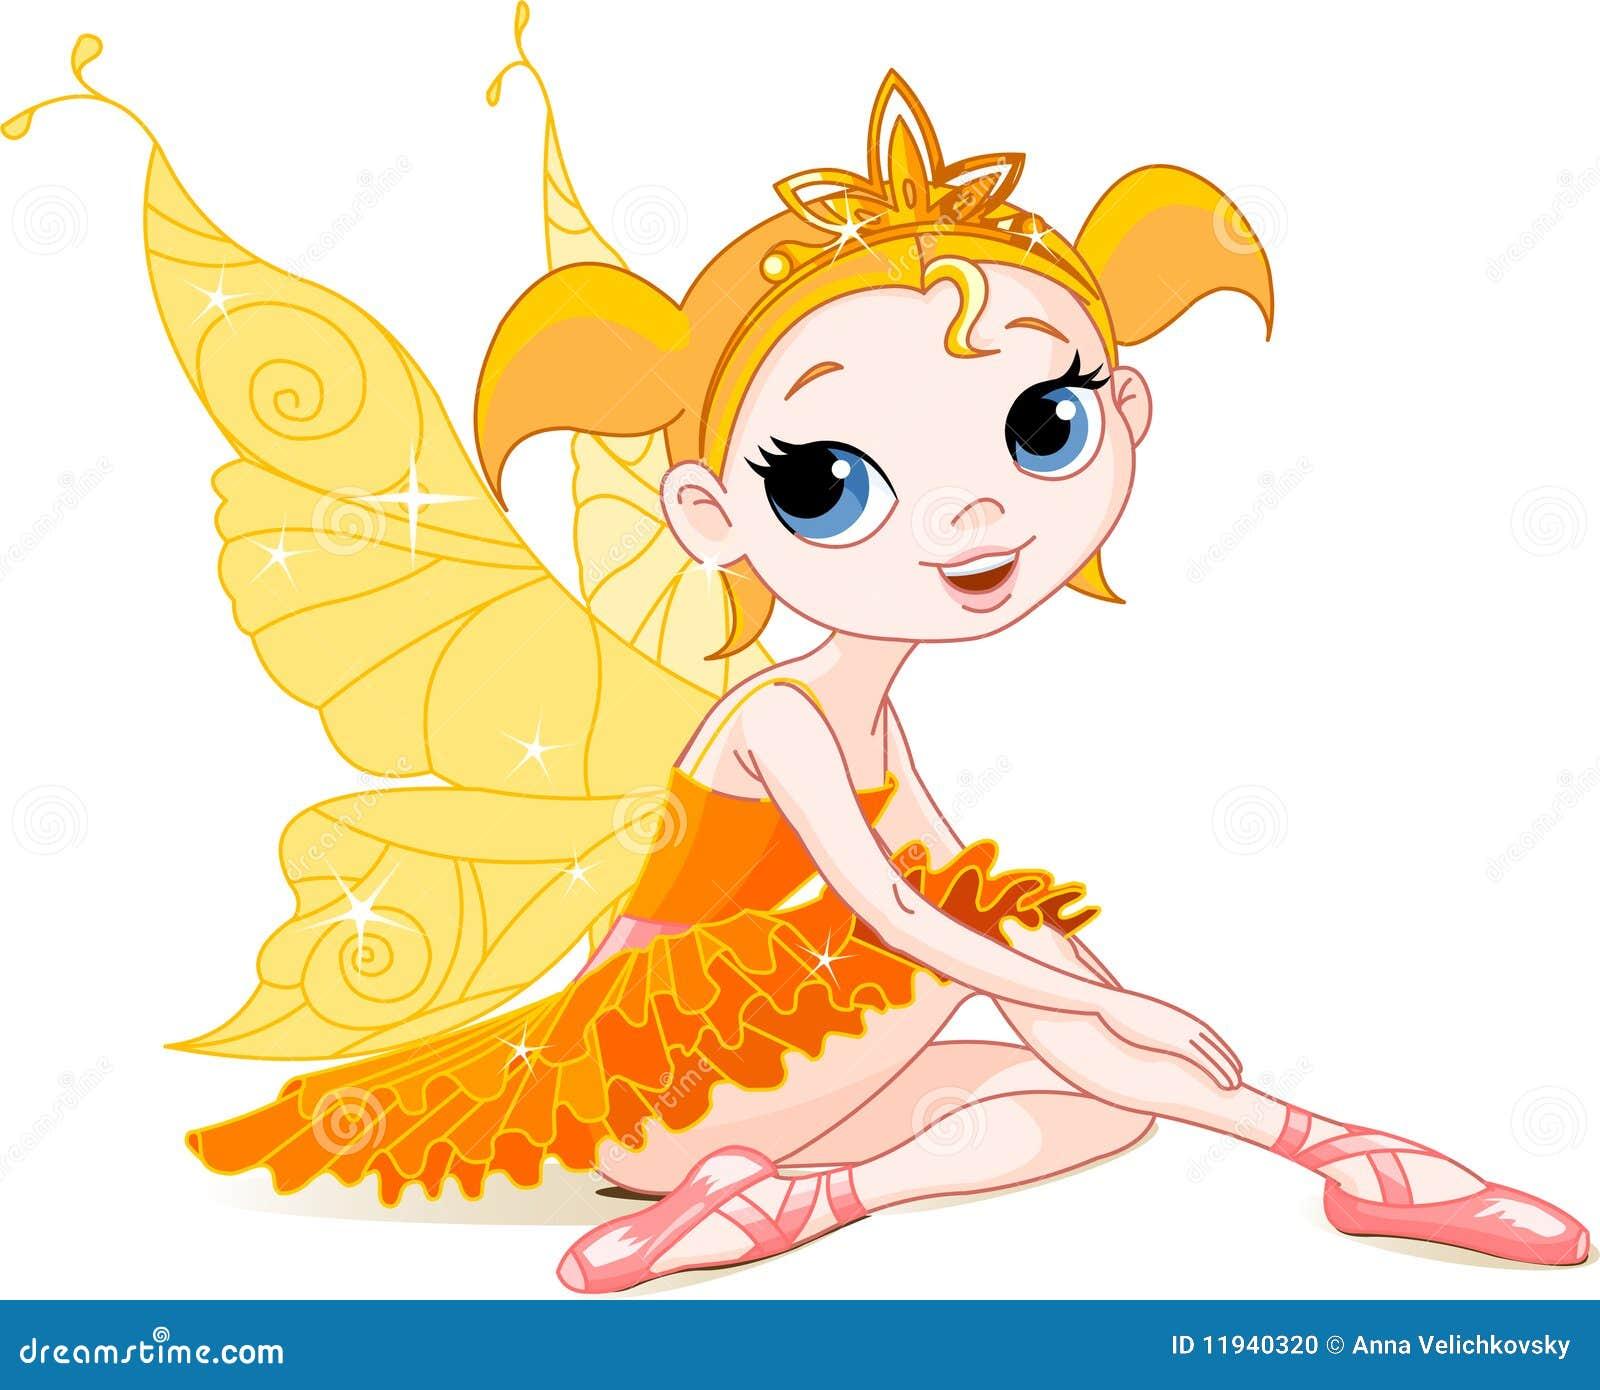 Pequeña bailarina de hadas anaranjada